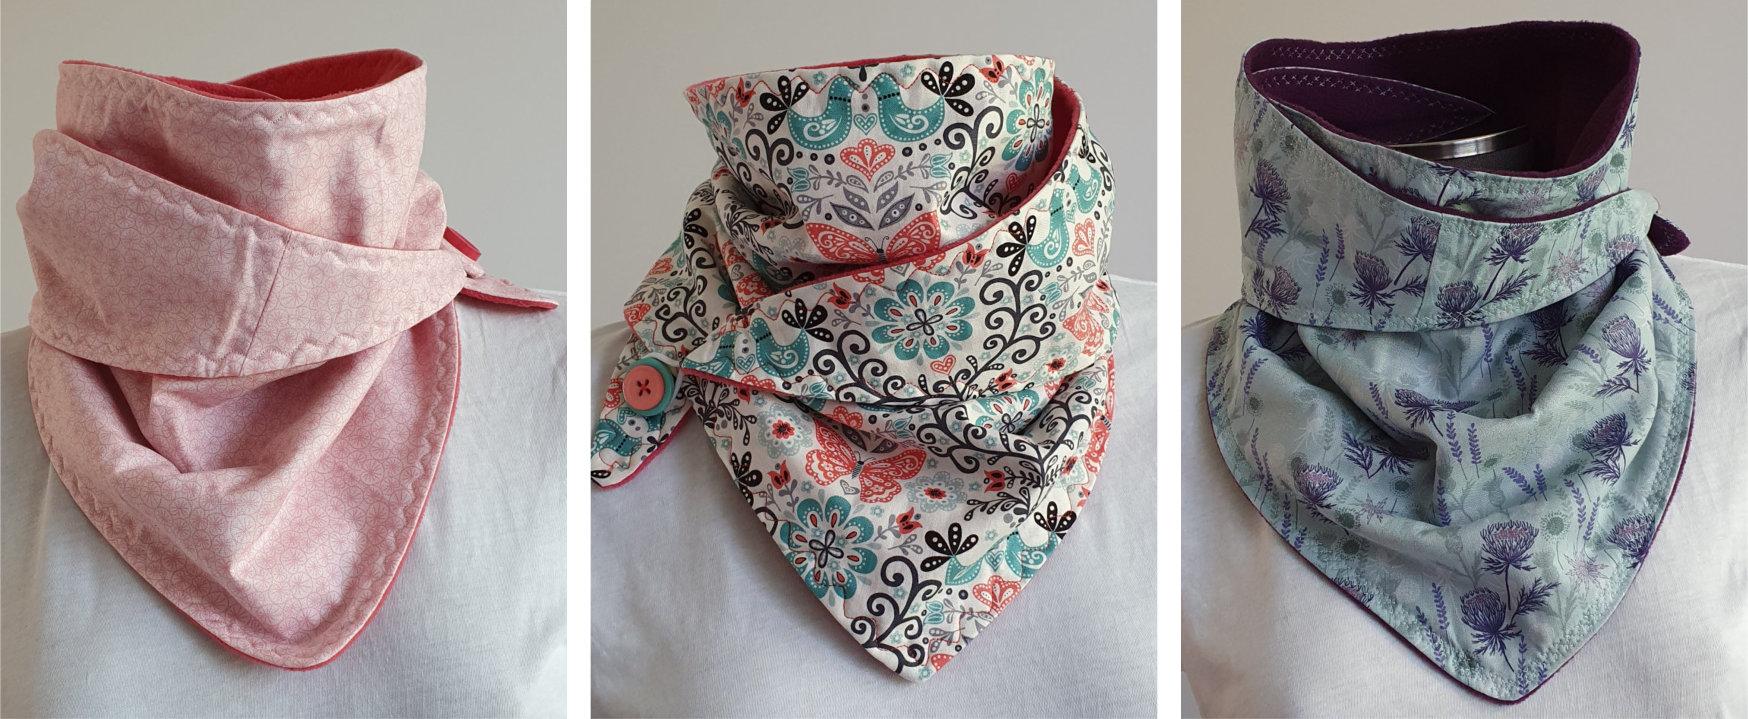 Ways to wear your scarf 2